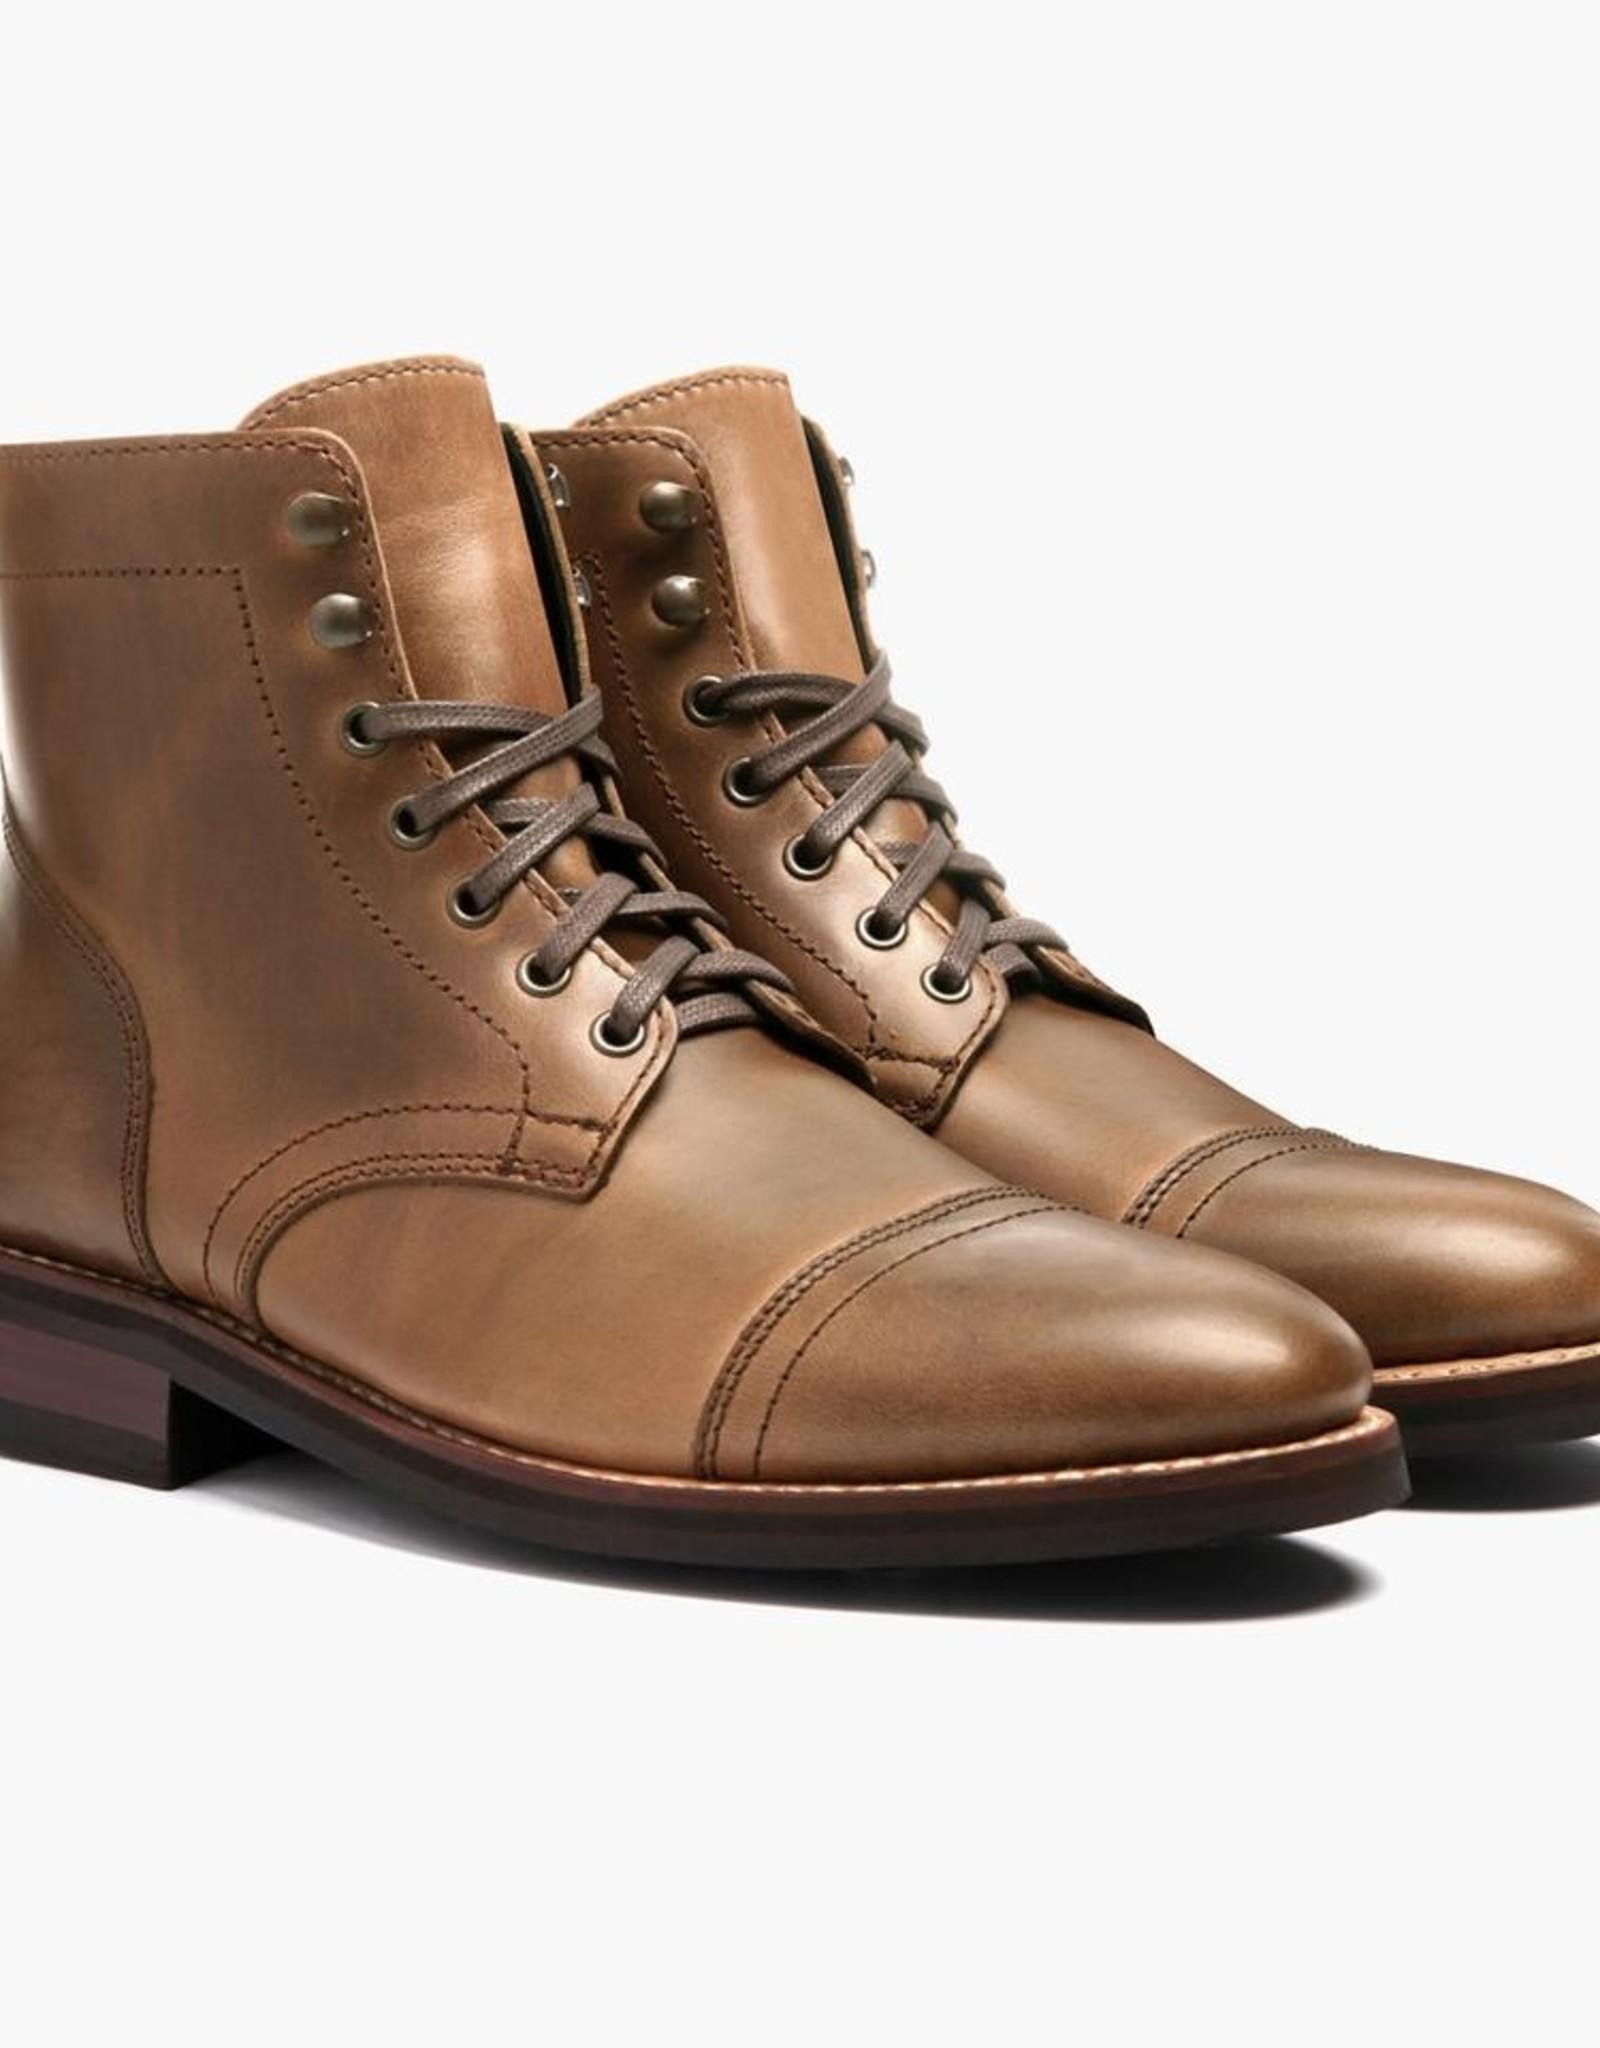 Captain Boot